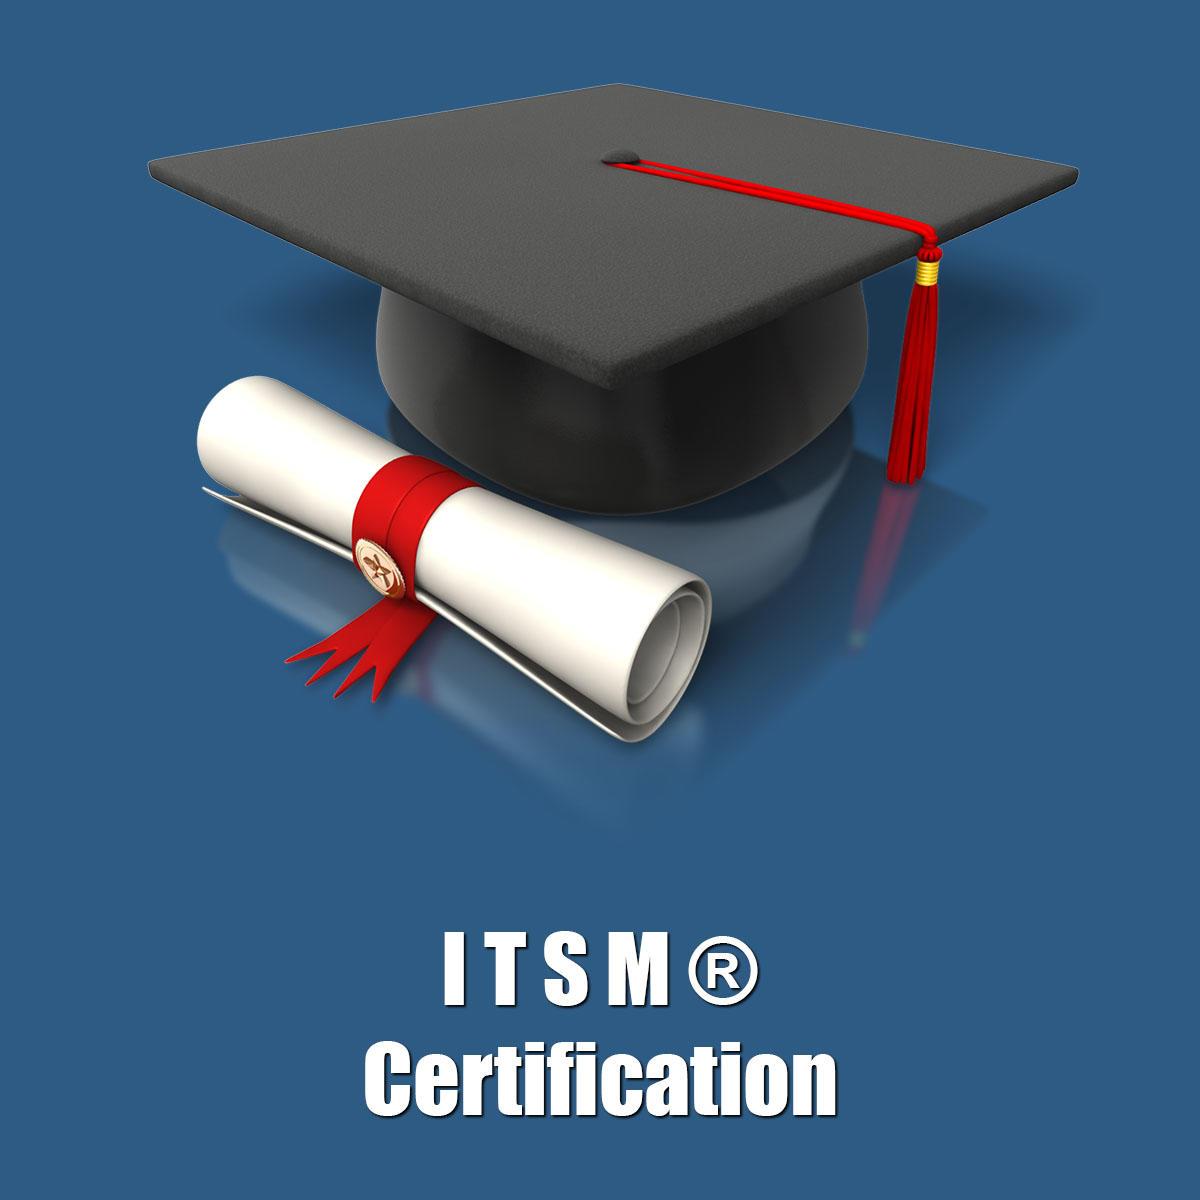 Itsm certification 30 days management square itsm certification 30 days xflitez Choice Image